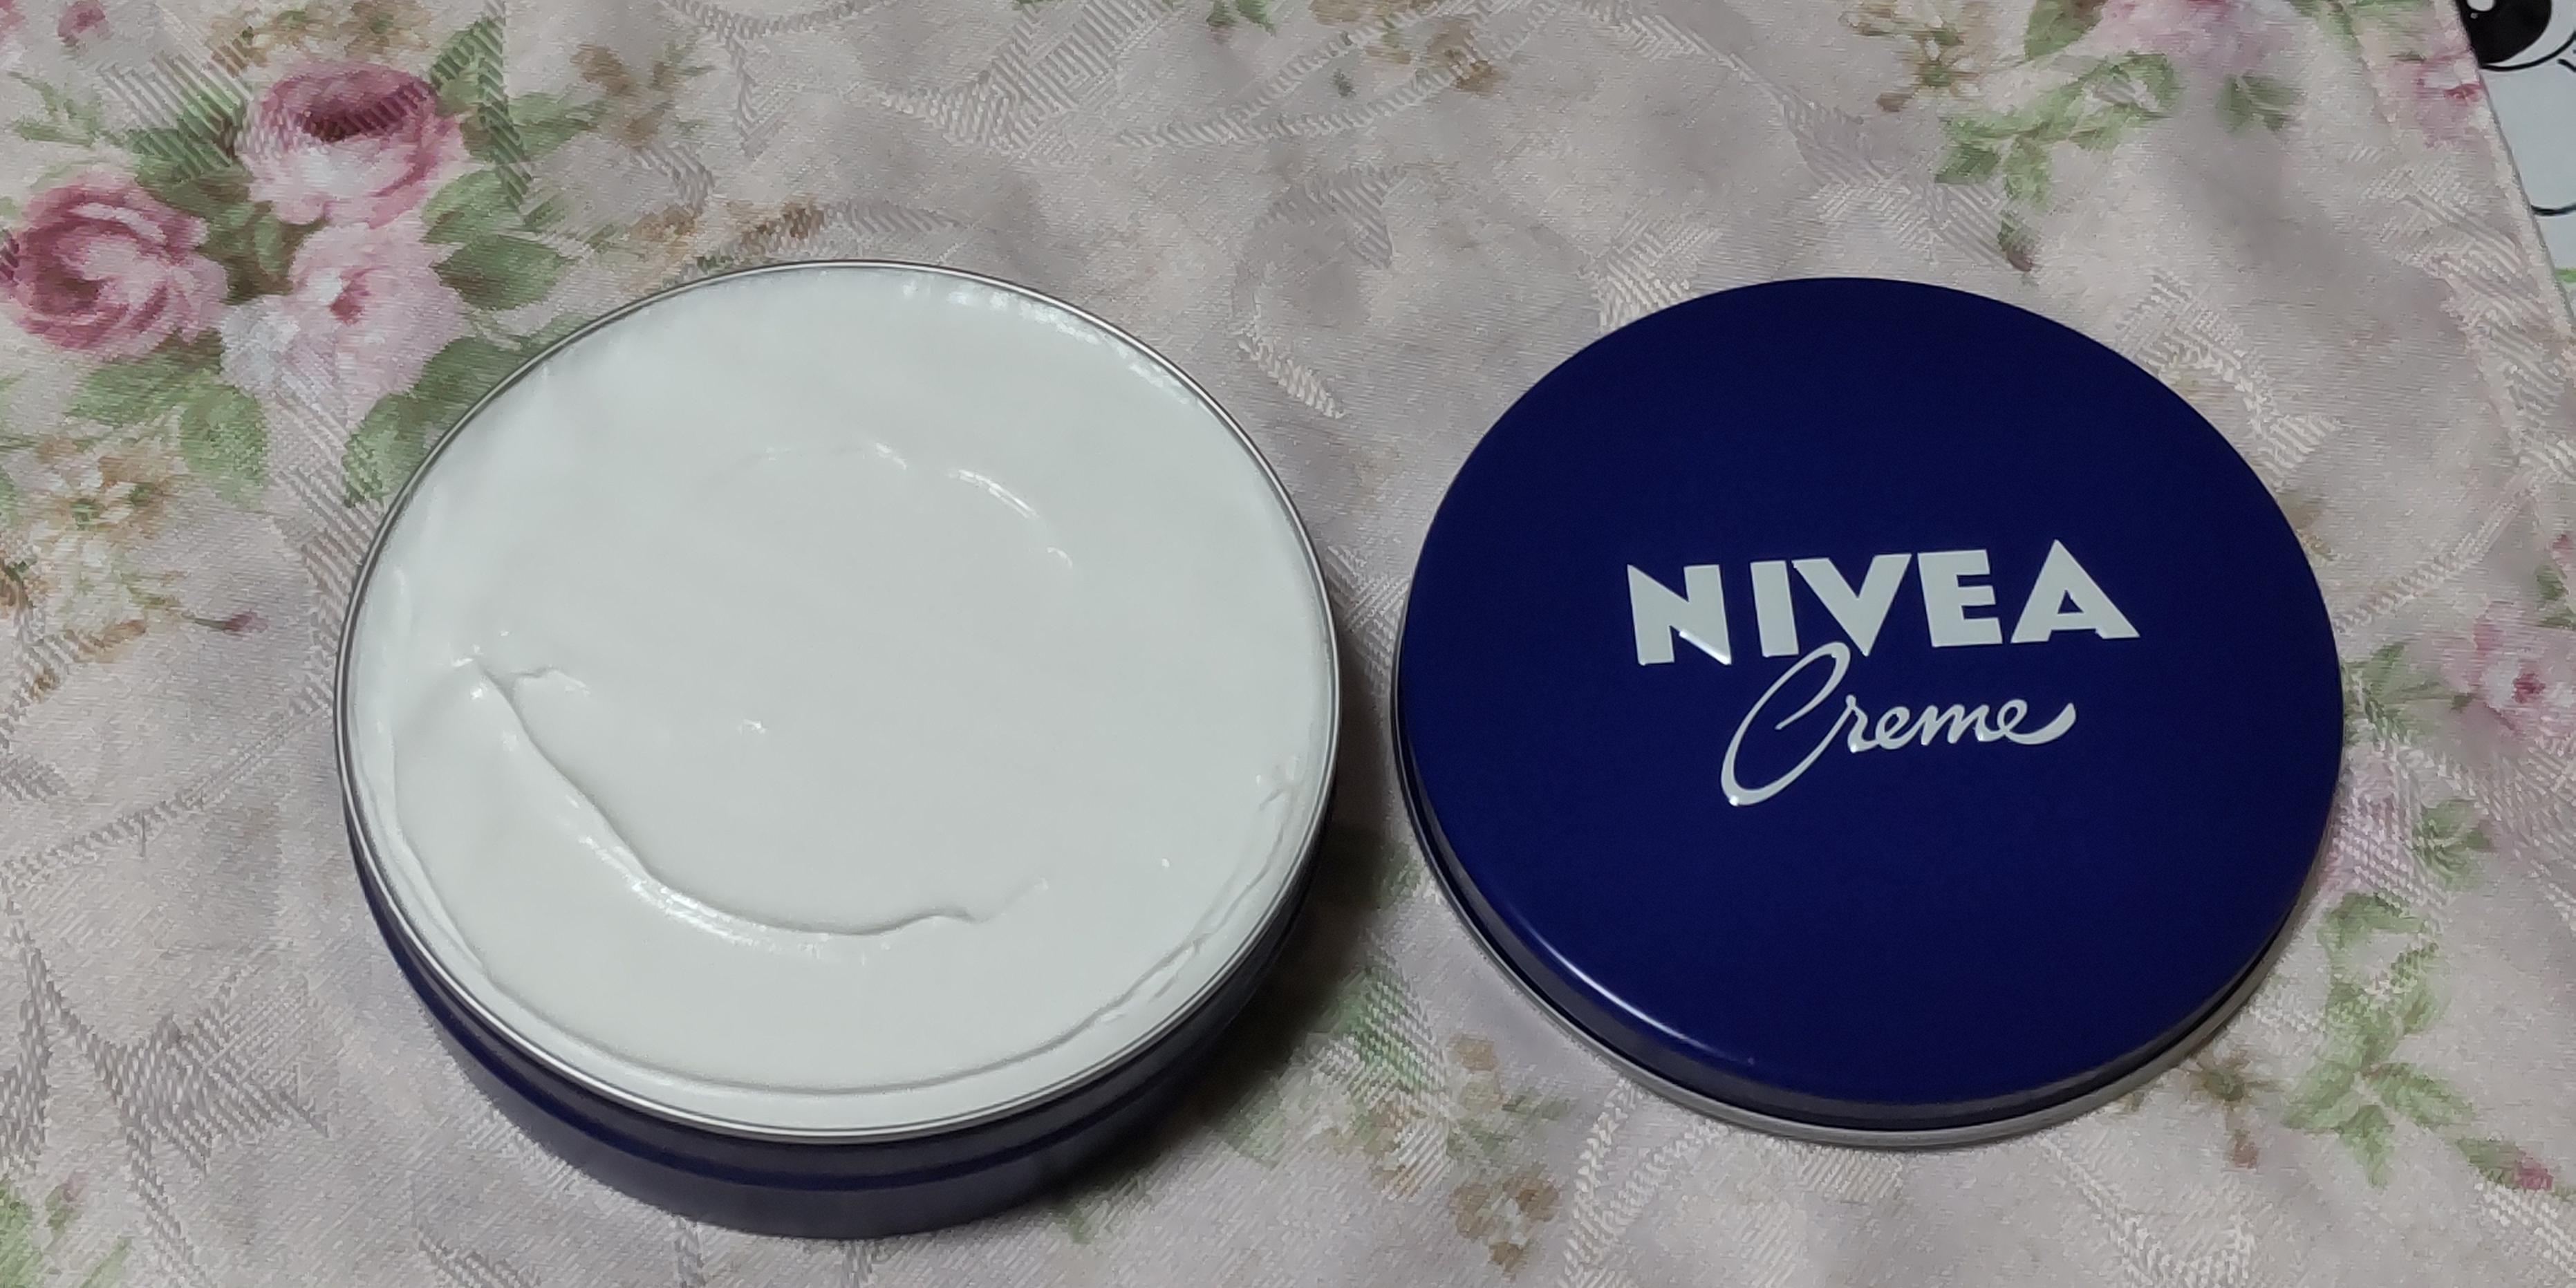 NIVEA(ニベア) クリーム(大缶)に関する白黒小豆さんの口コミ画像3